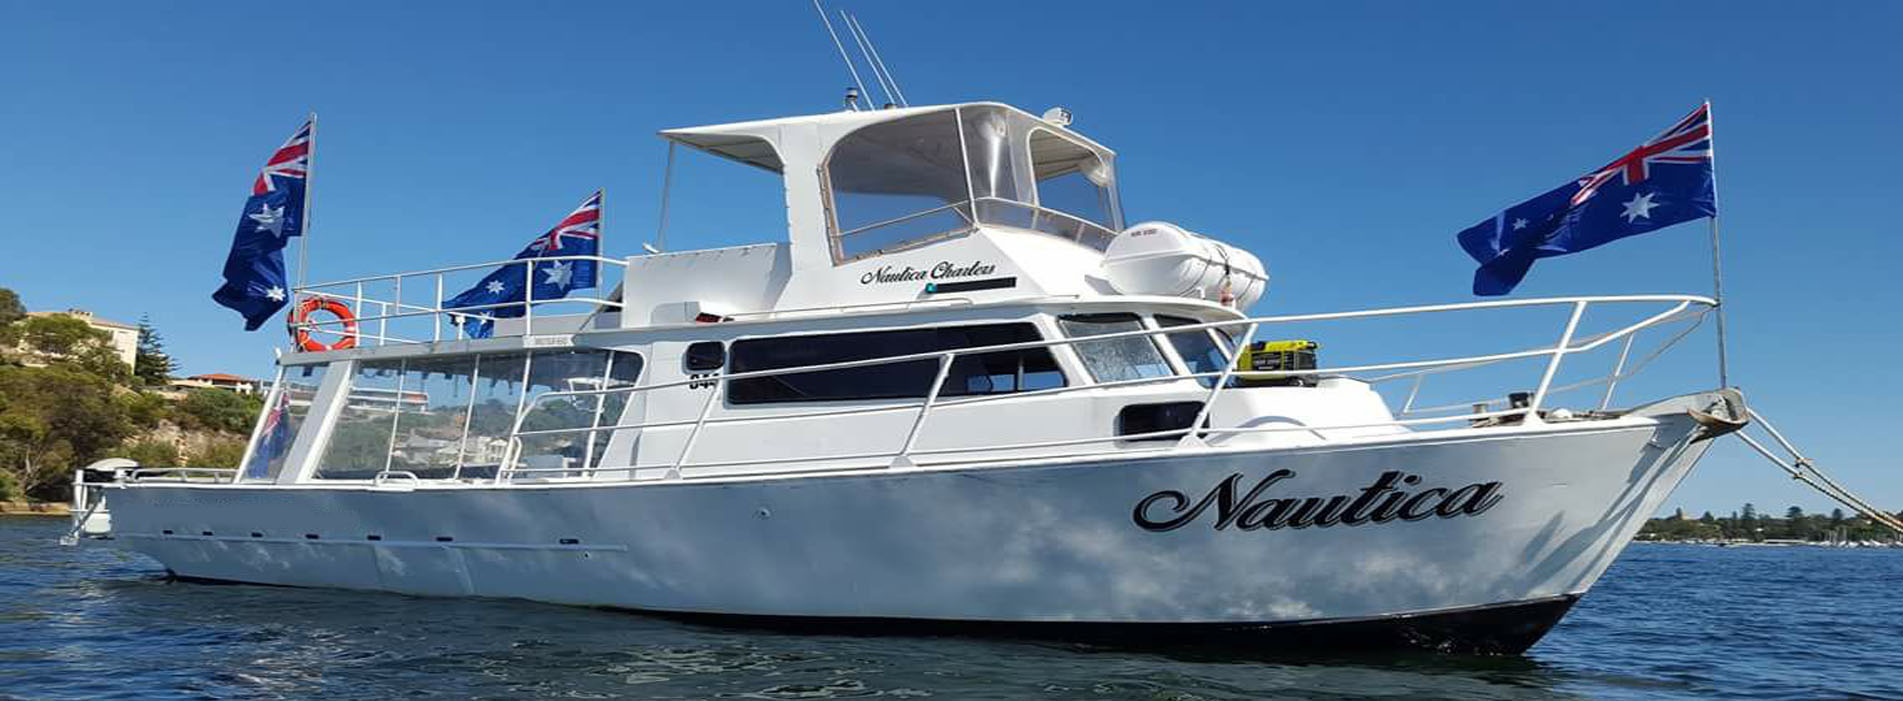 NAUTICA-BOAT-CHARTERS-side-profile-of-boat1